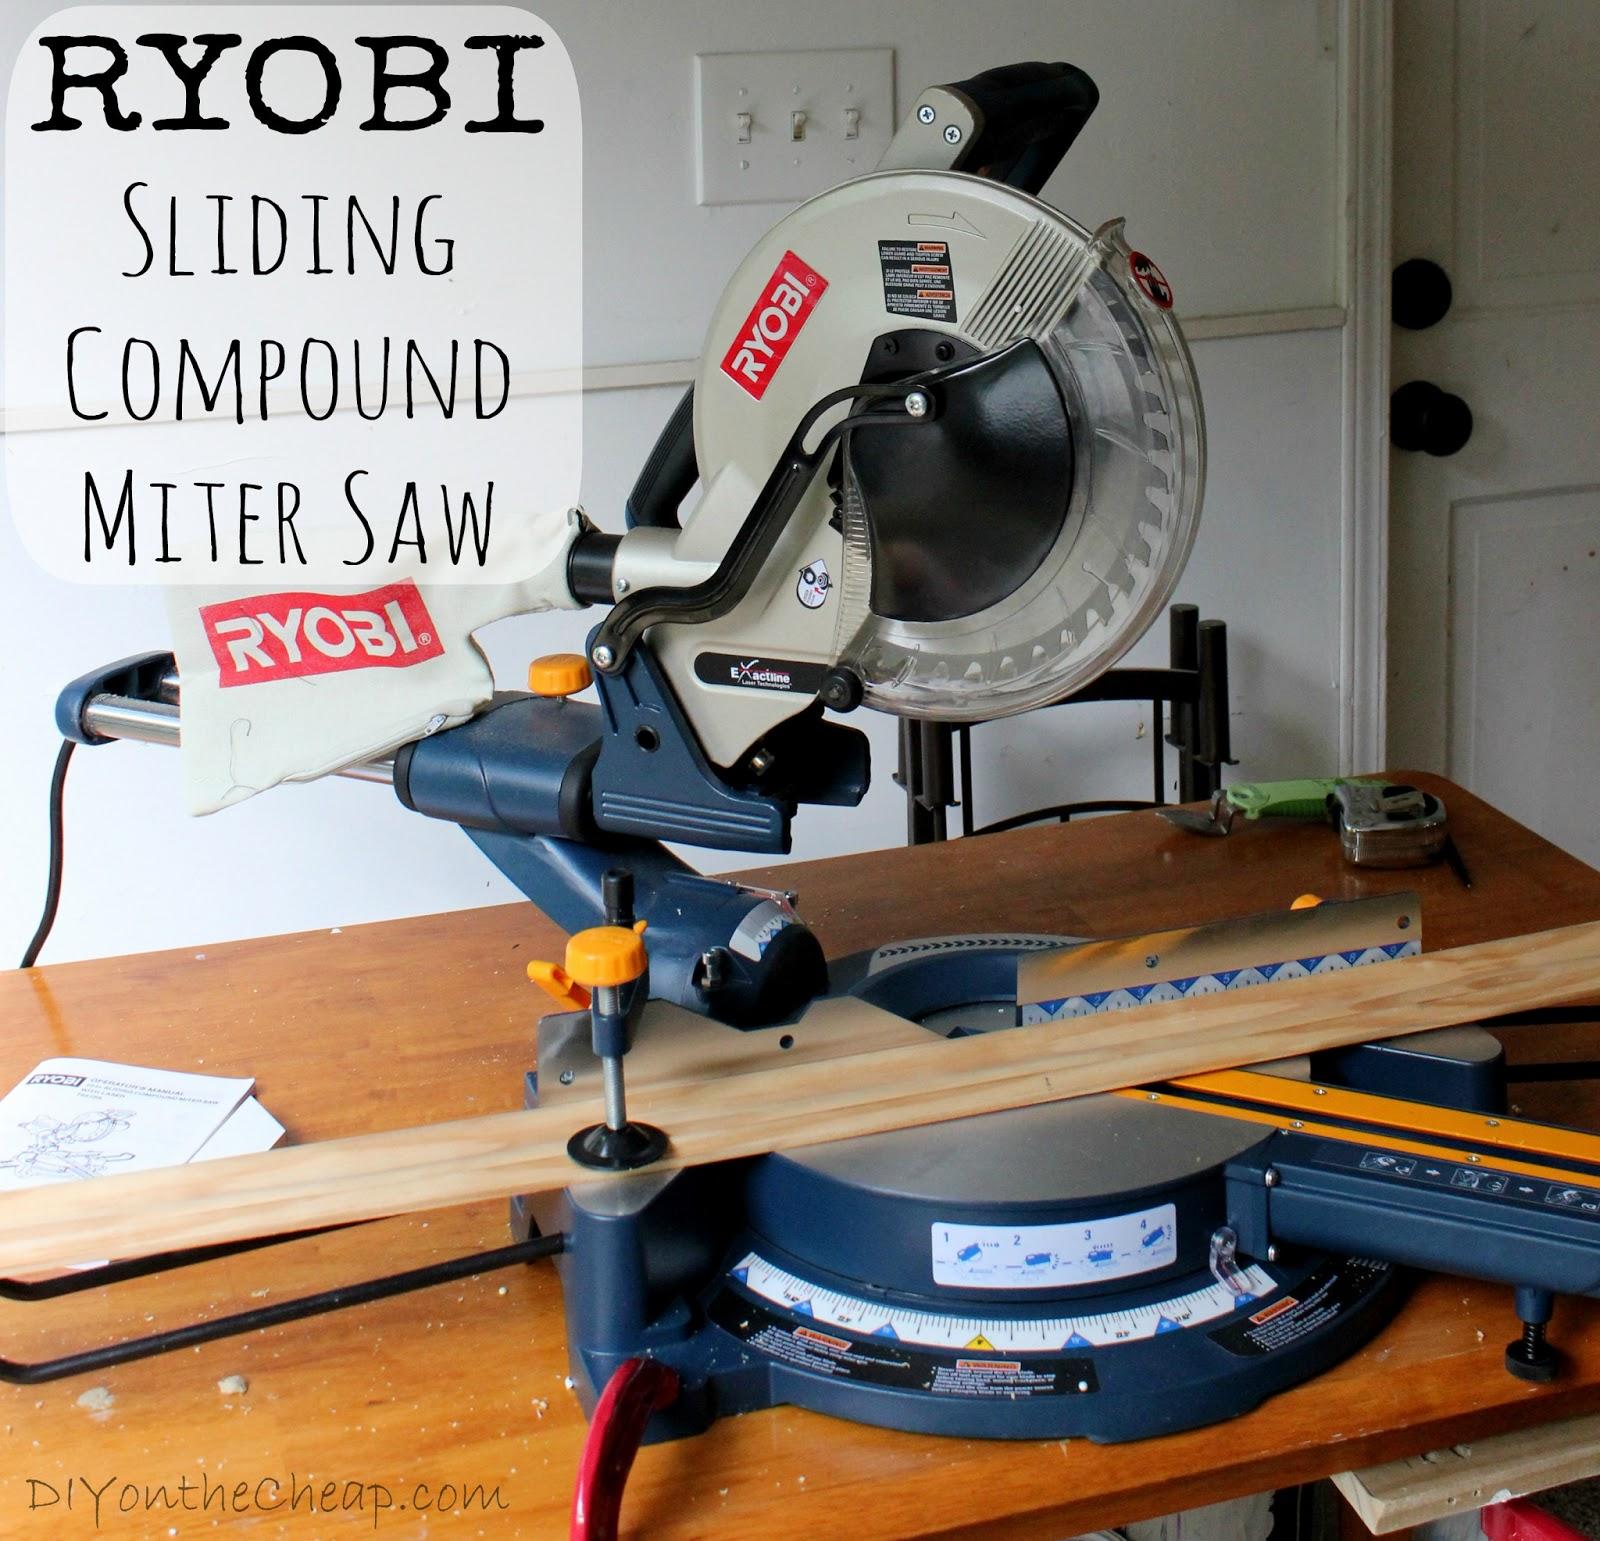 Ryobi 10 Miter Saw Review